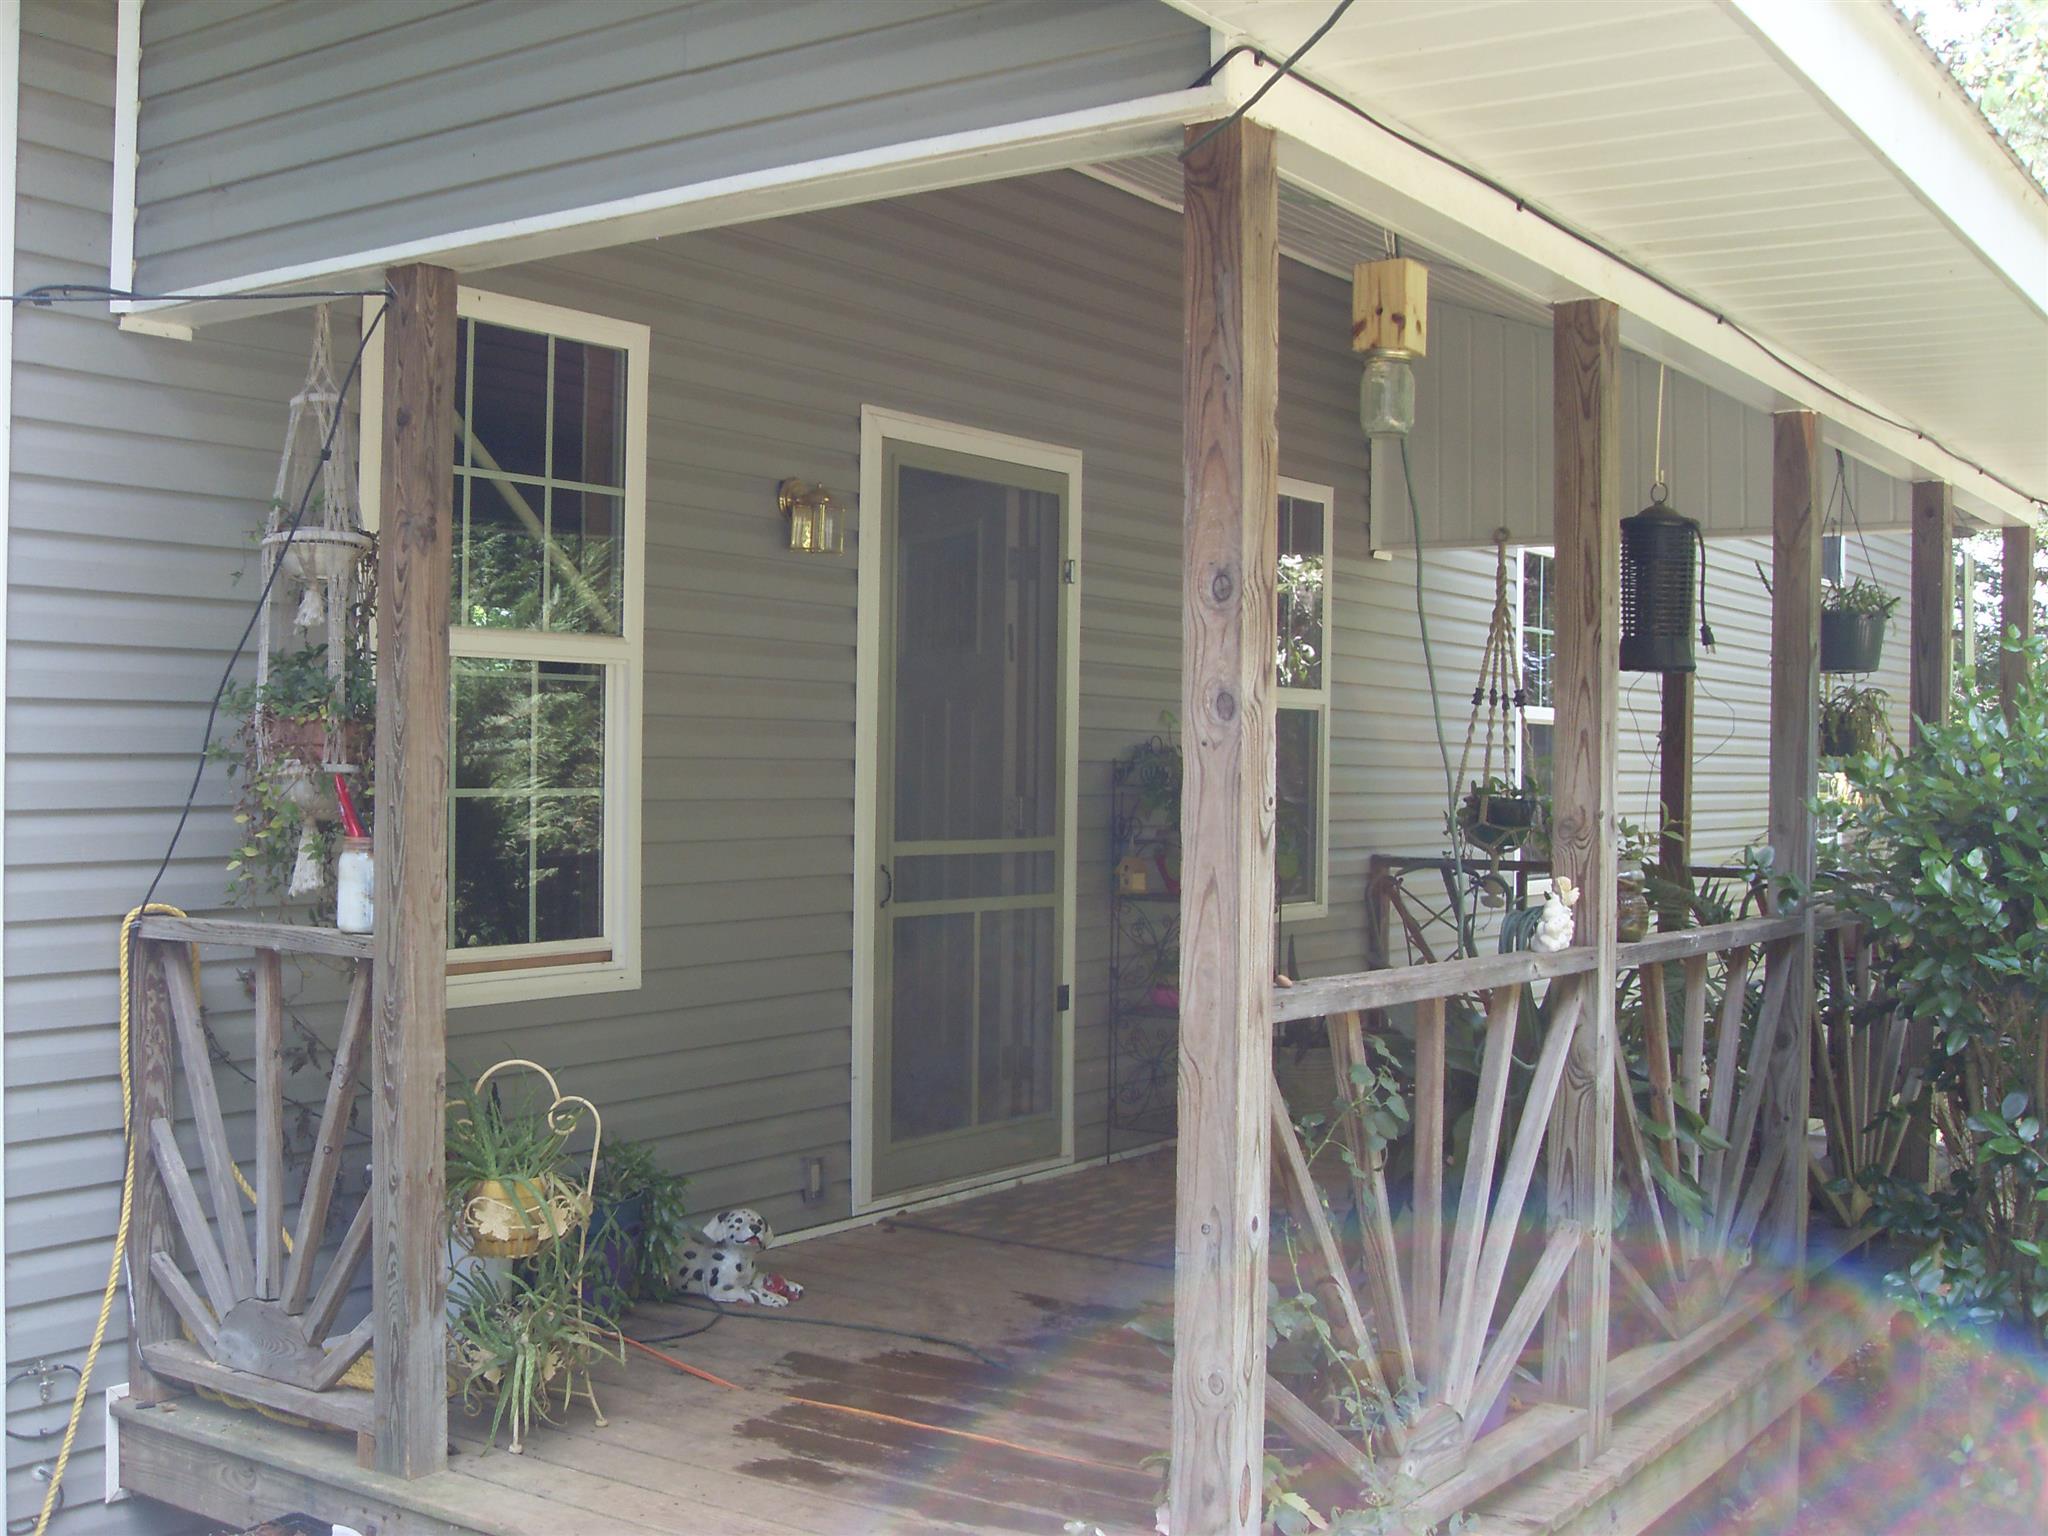 101 James Brown Ln, Ethridge, TN 38456